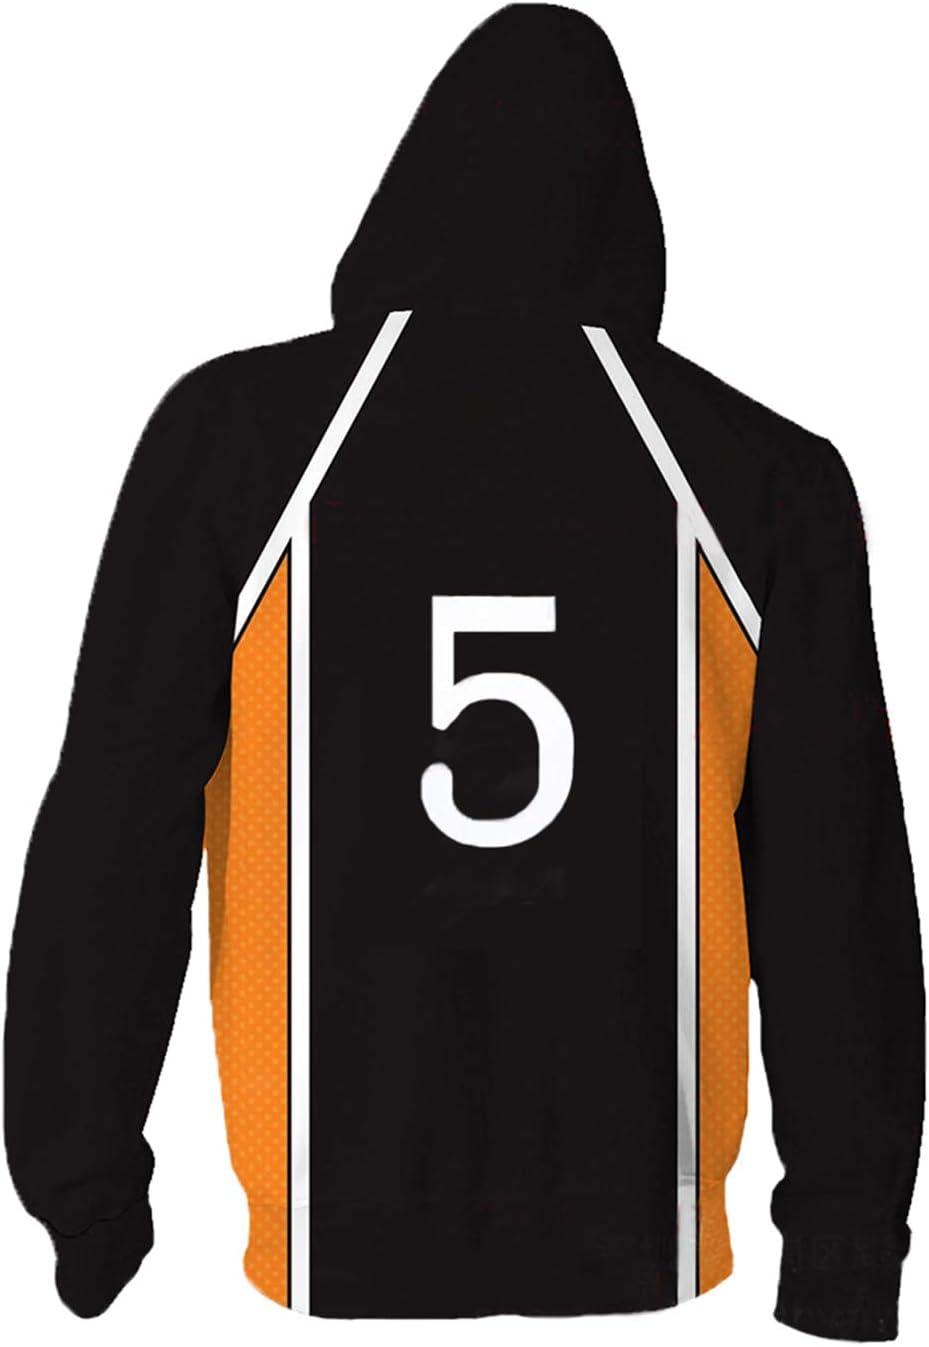 Sawamura Daichi No.1 Hoodie Jacke Karasuno Kageyama Cosplay Kost/üm Kapuzenpullover Pullover Sweatshirt High School Mantel